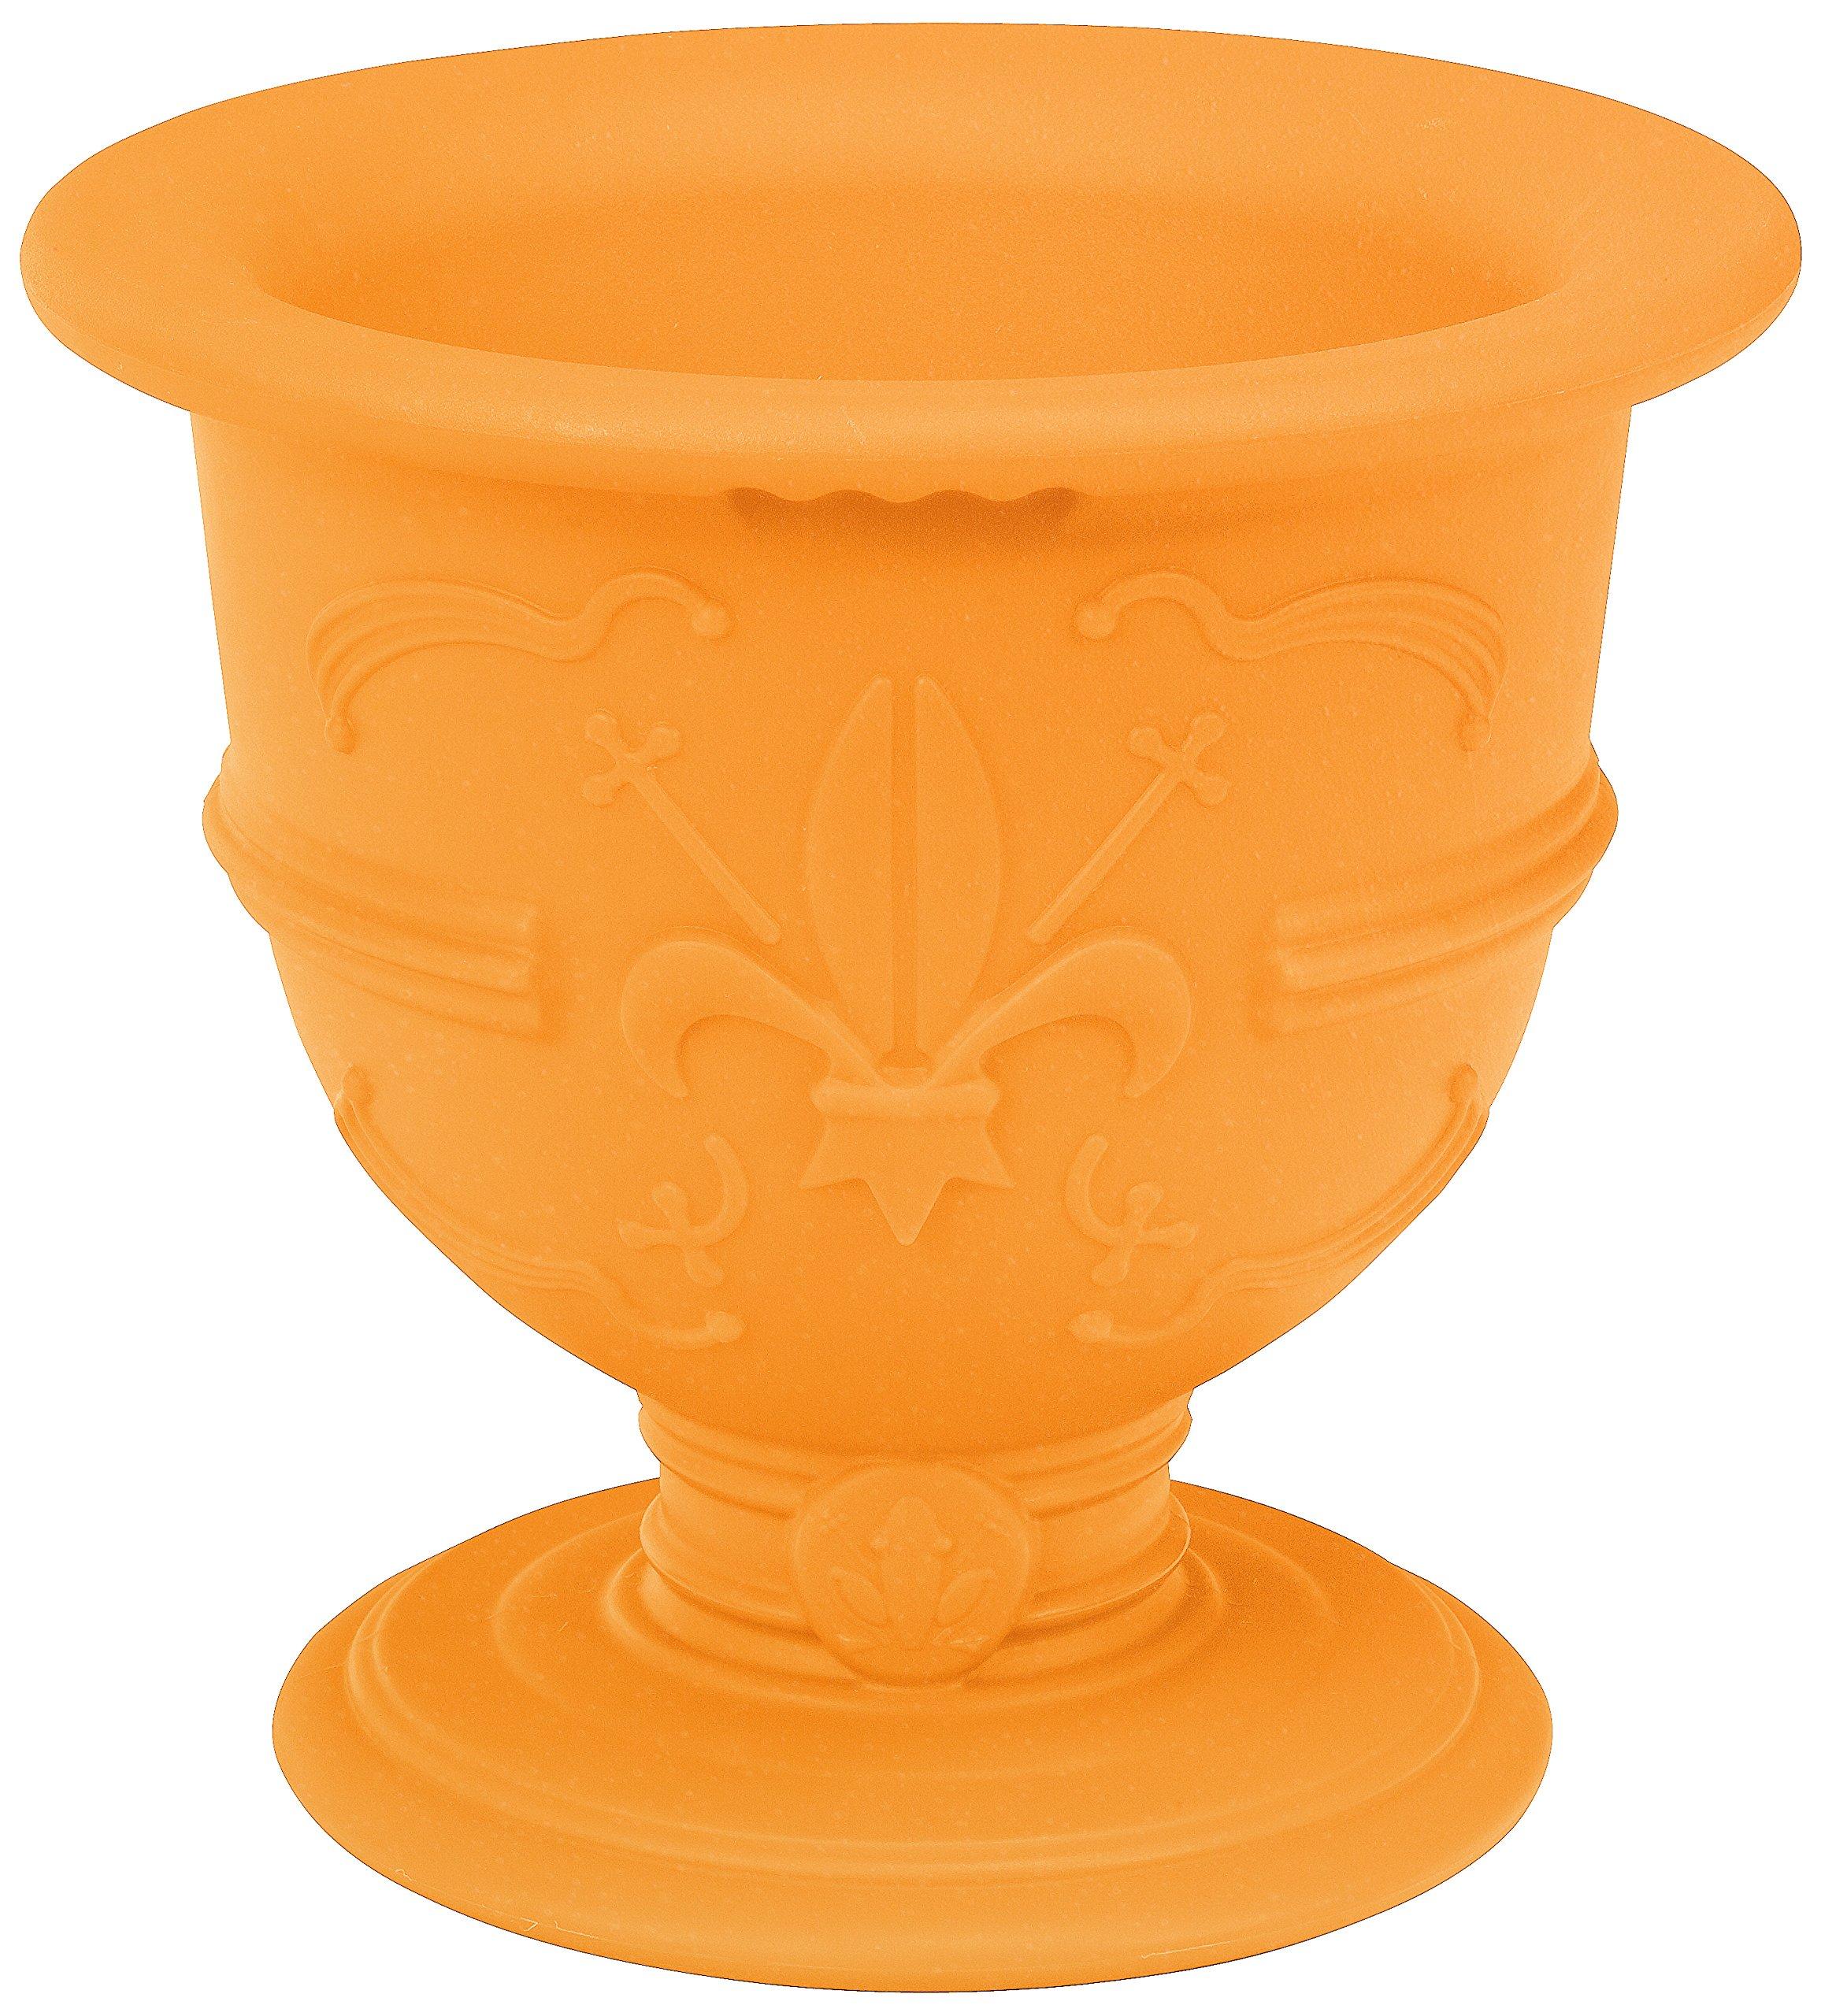 Slide Design SD POL035 FC 'Pot of Love' Bottle/Ice Holder in Standard Colours, Pure Orange